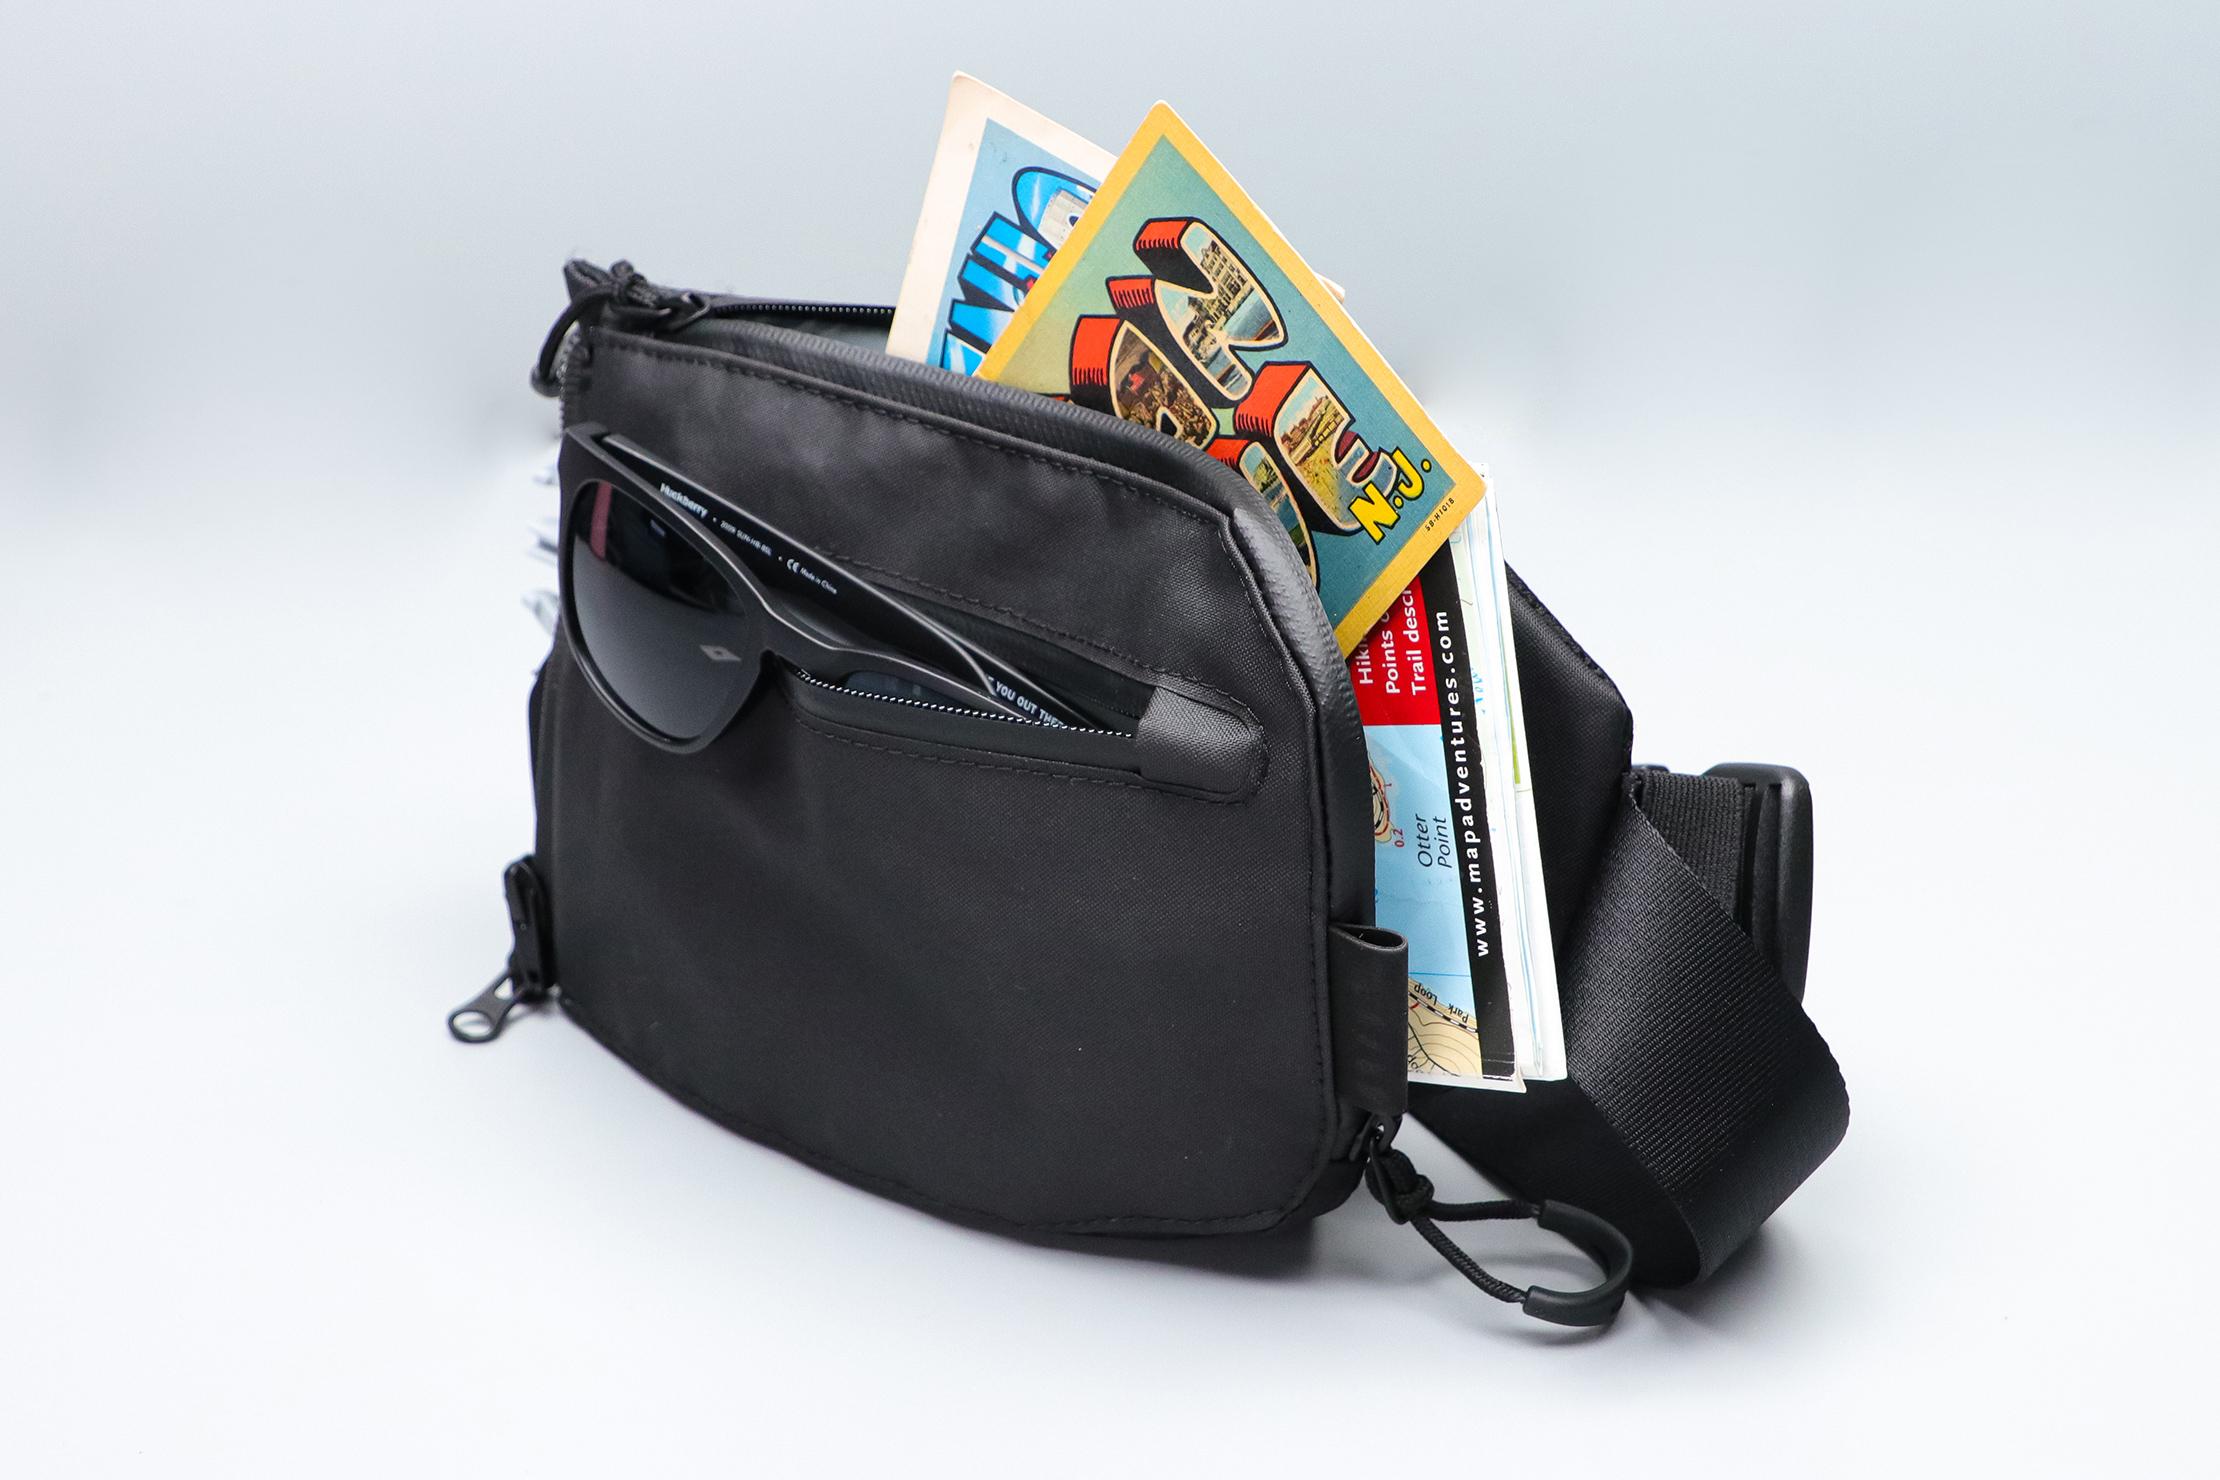 Gravel Backpack Travel System Hip Strap Packed